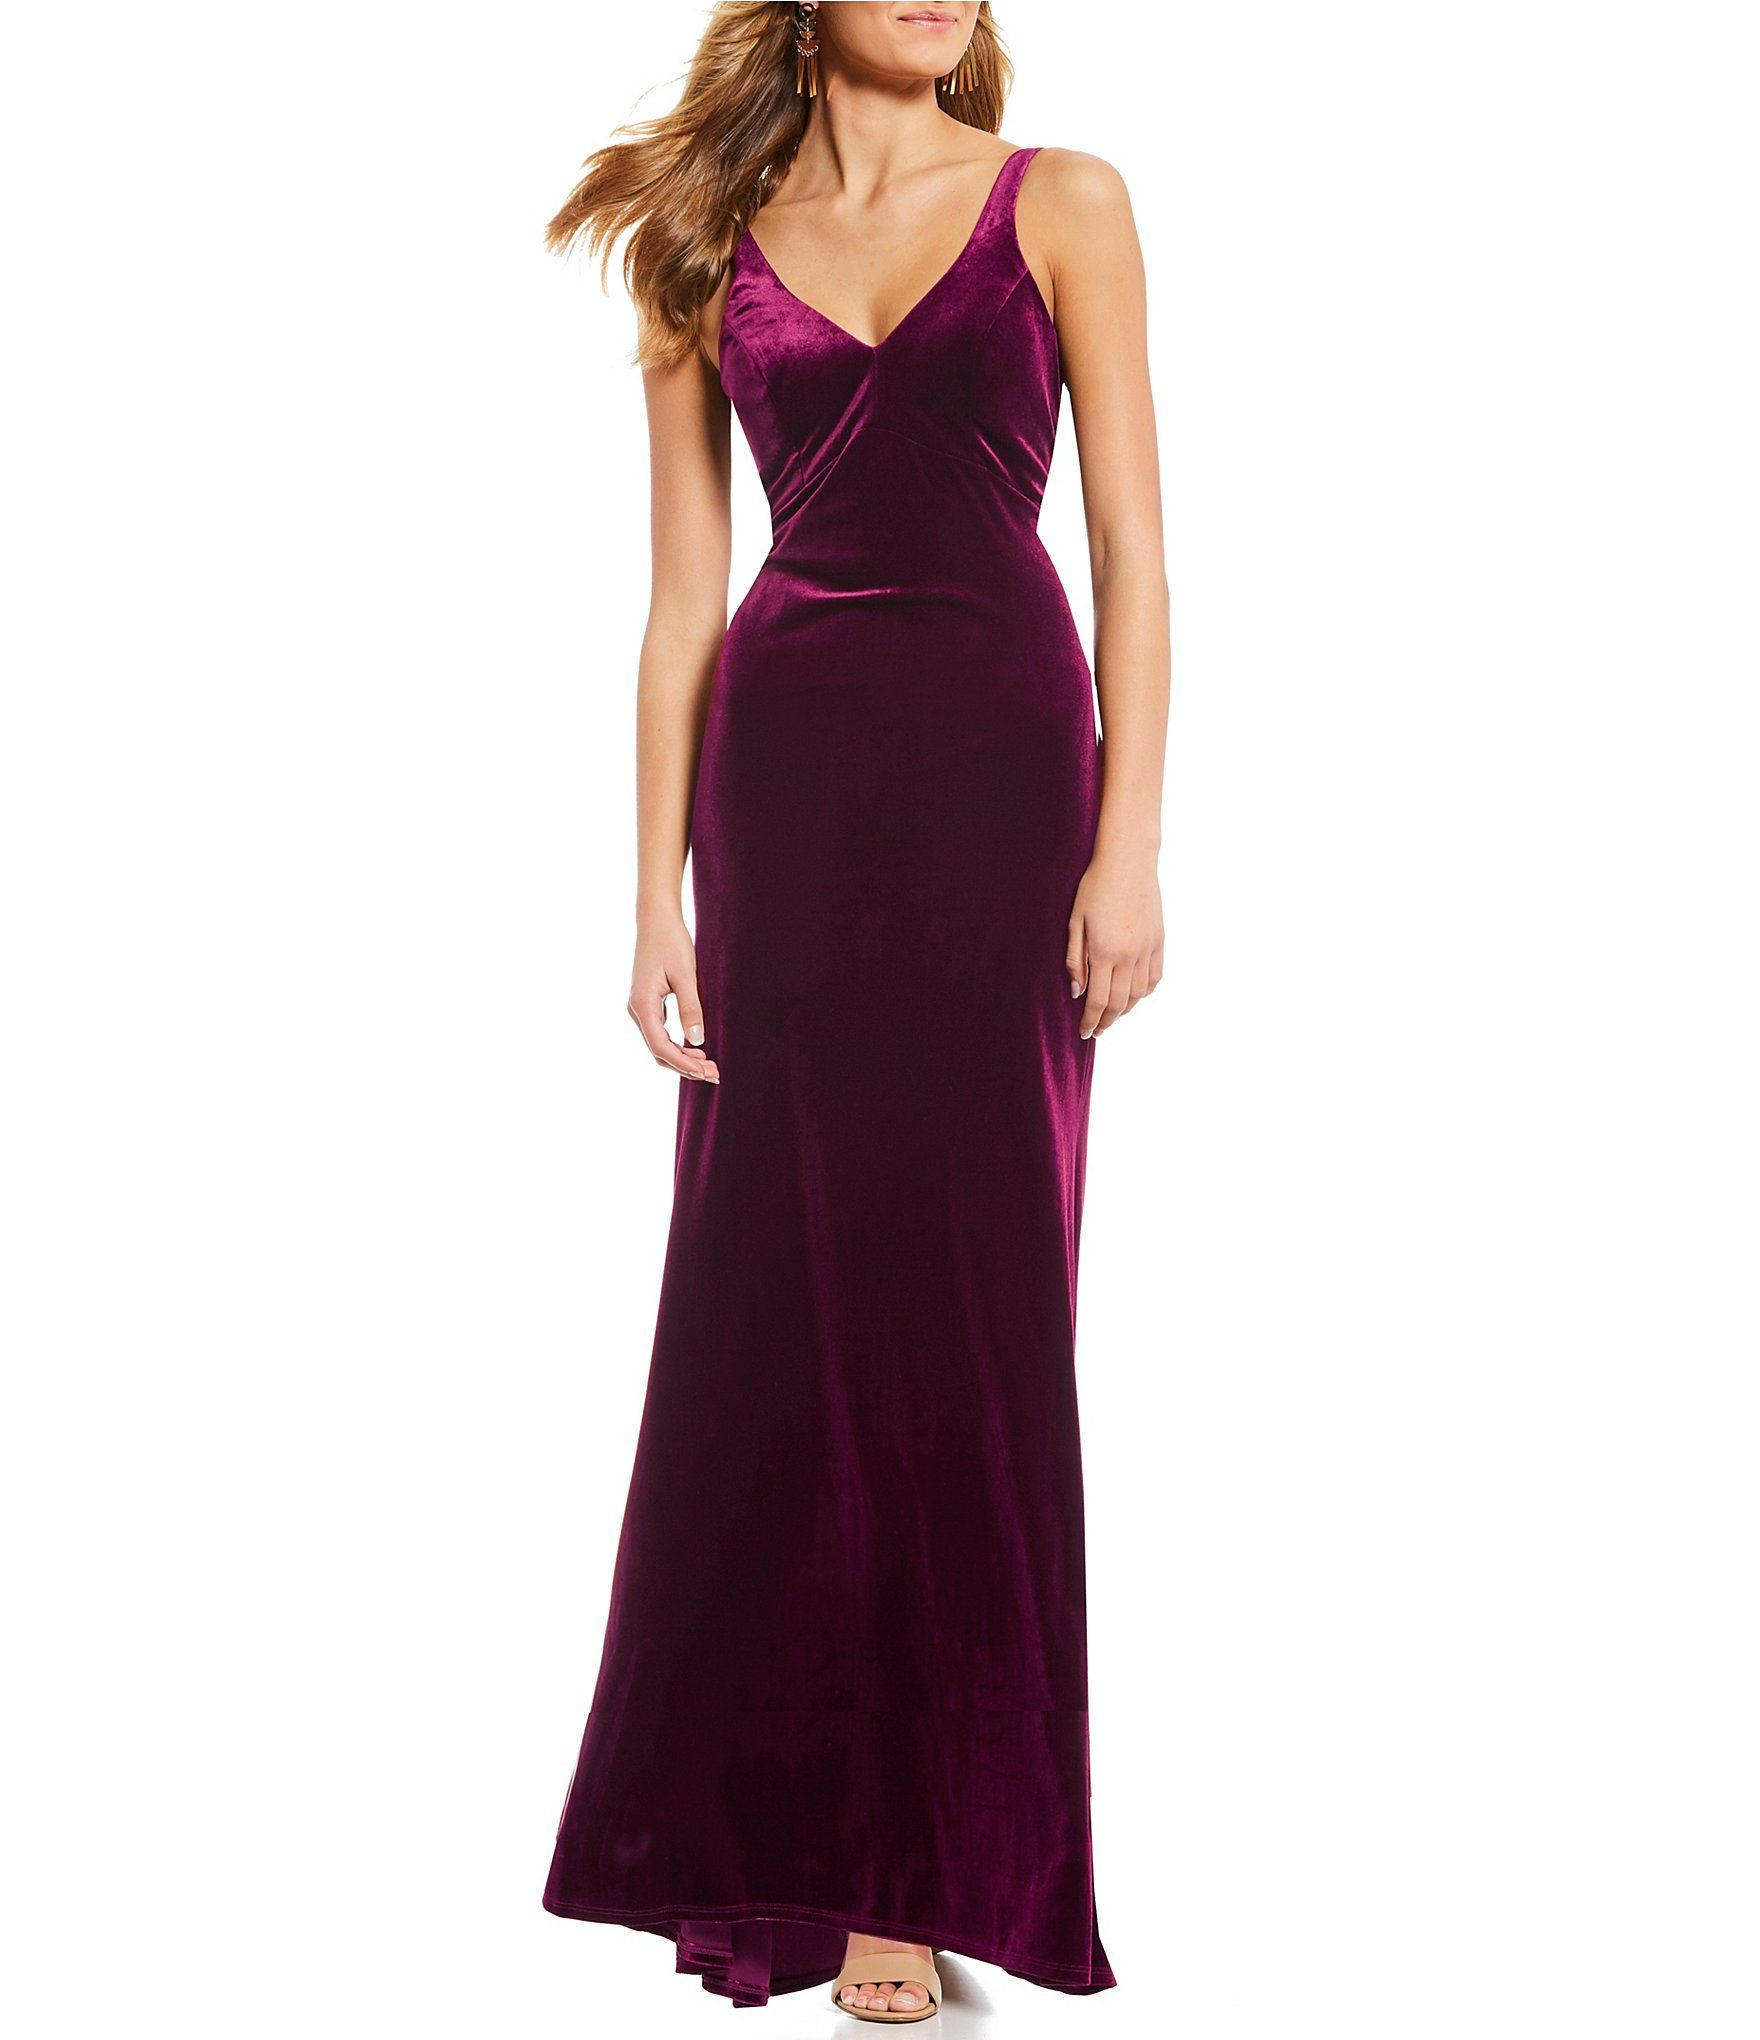 0c89a5034c5 Sequin Hearts PlungingVNeck Long Velvet Dress  Dillards